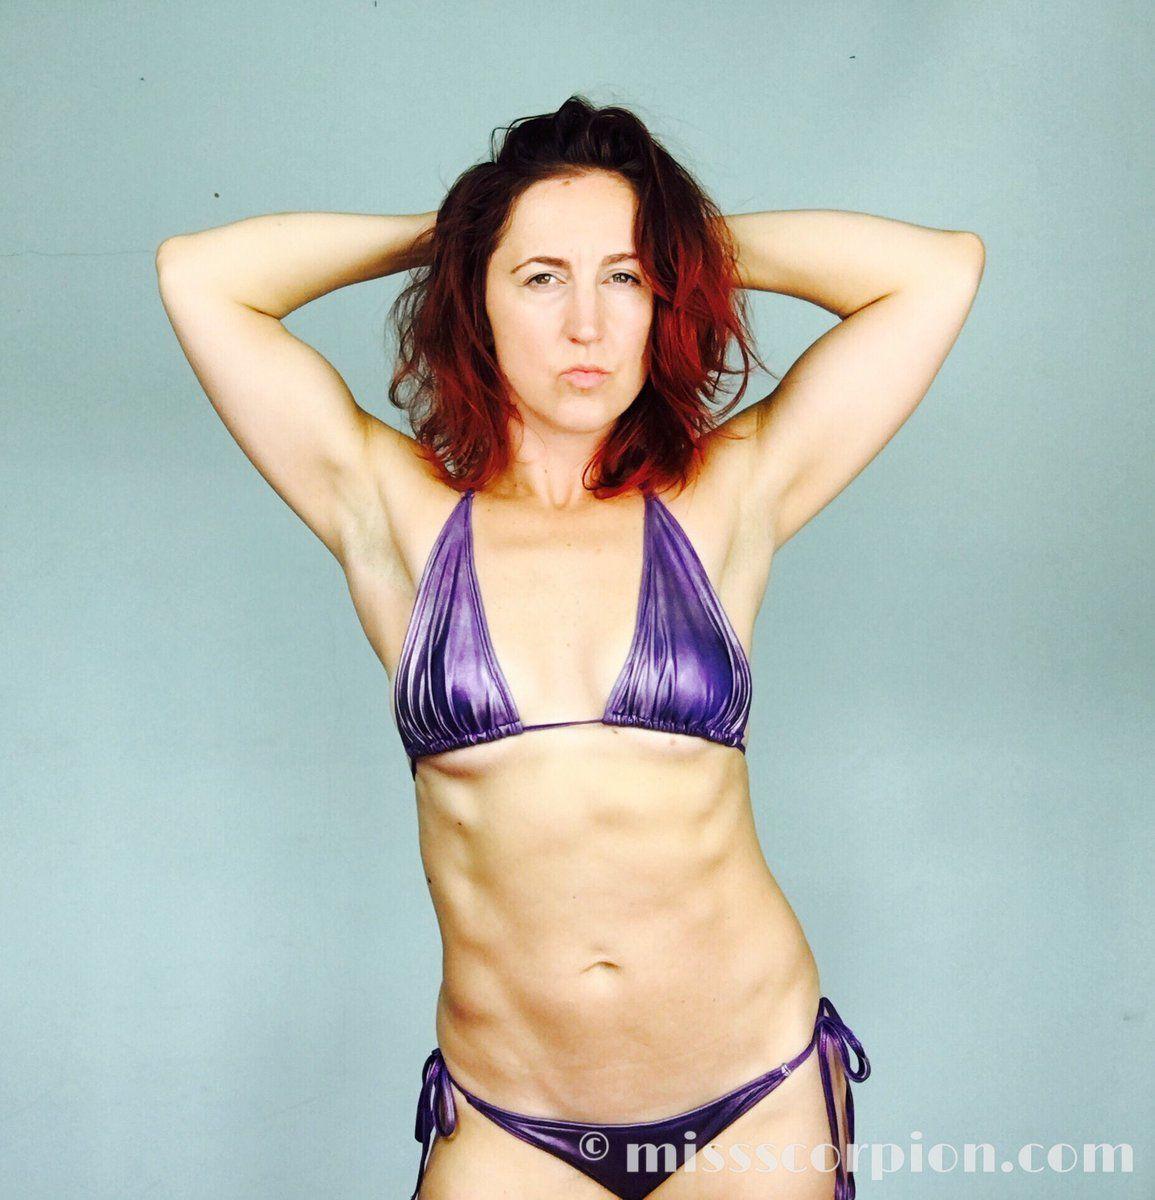 Rachel reynolds nude fakes